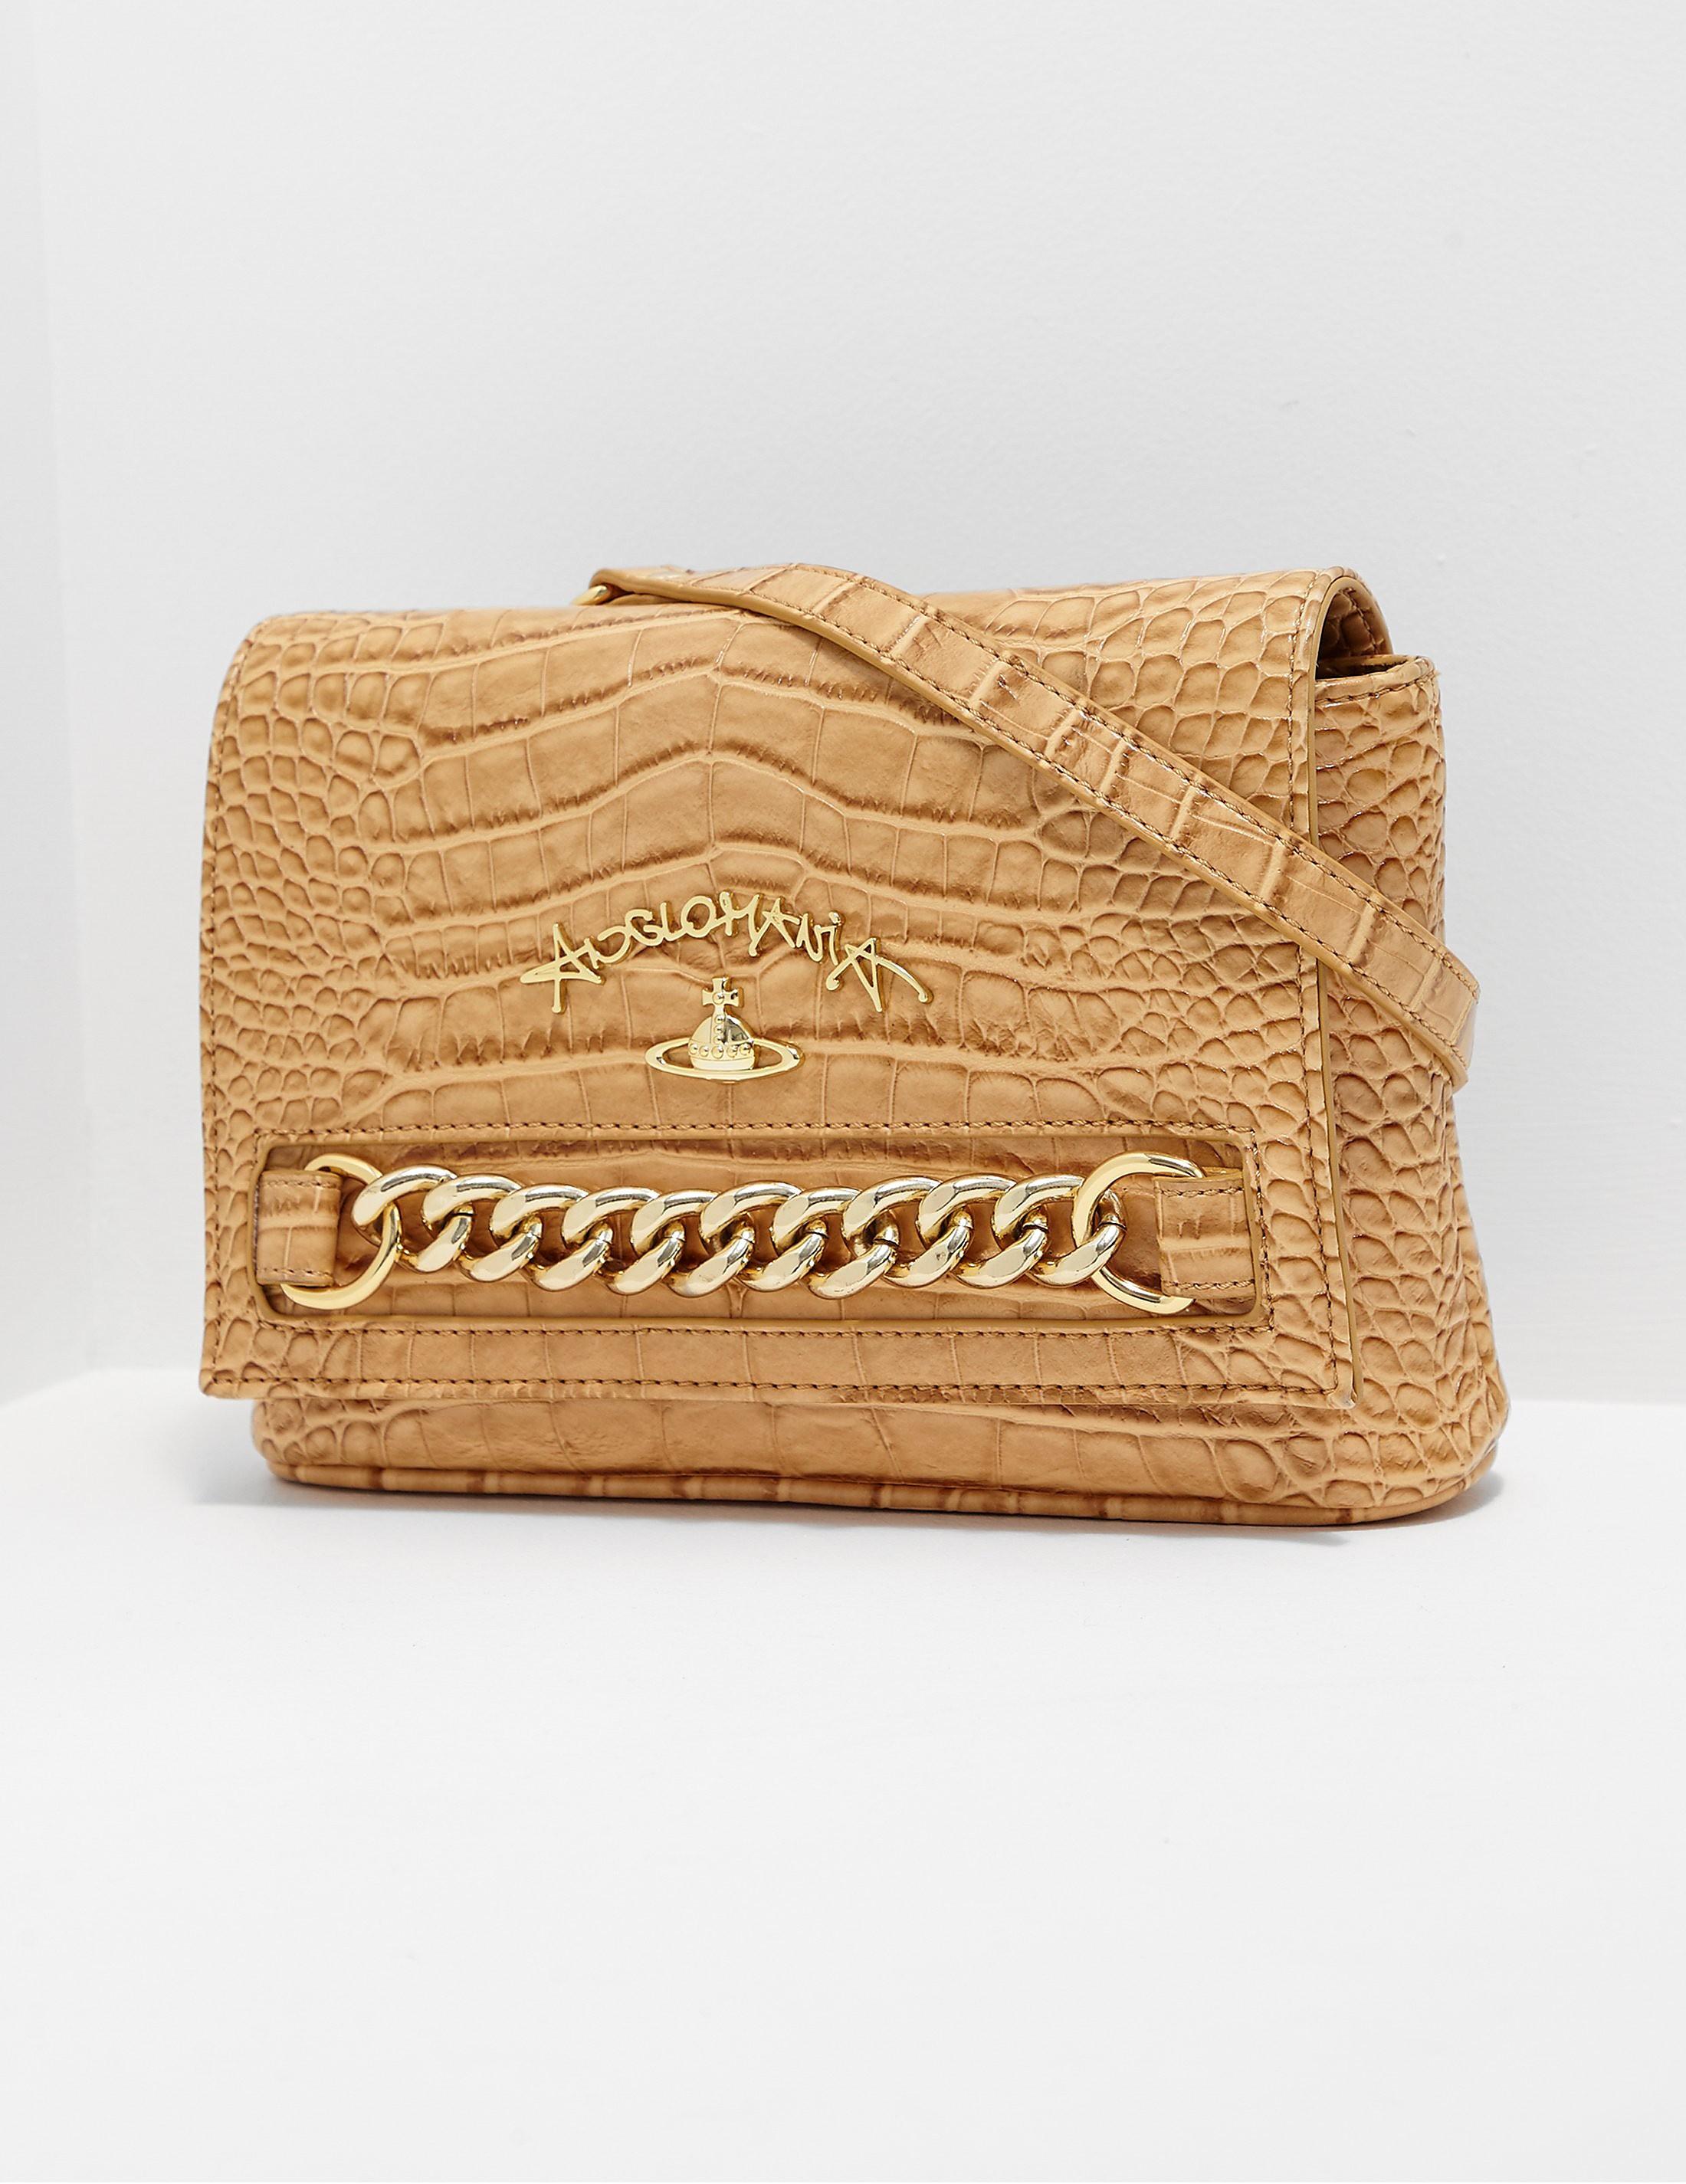 Vivienne Westwood Dorset Crossbody Bag